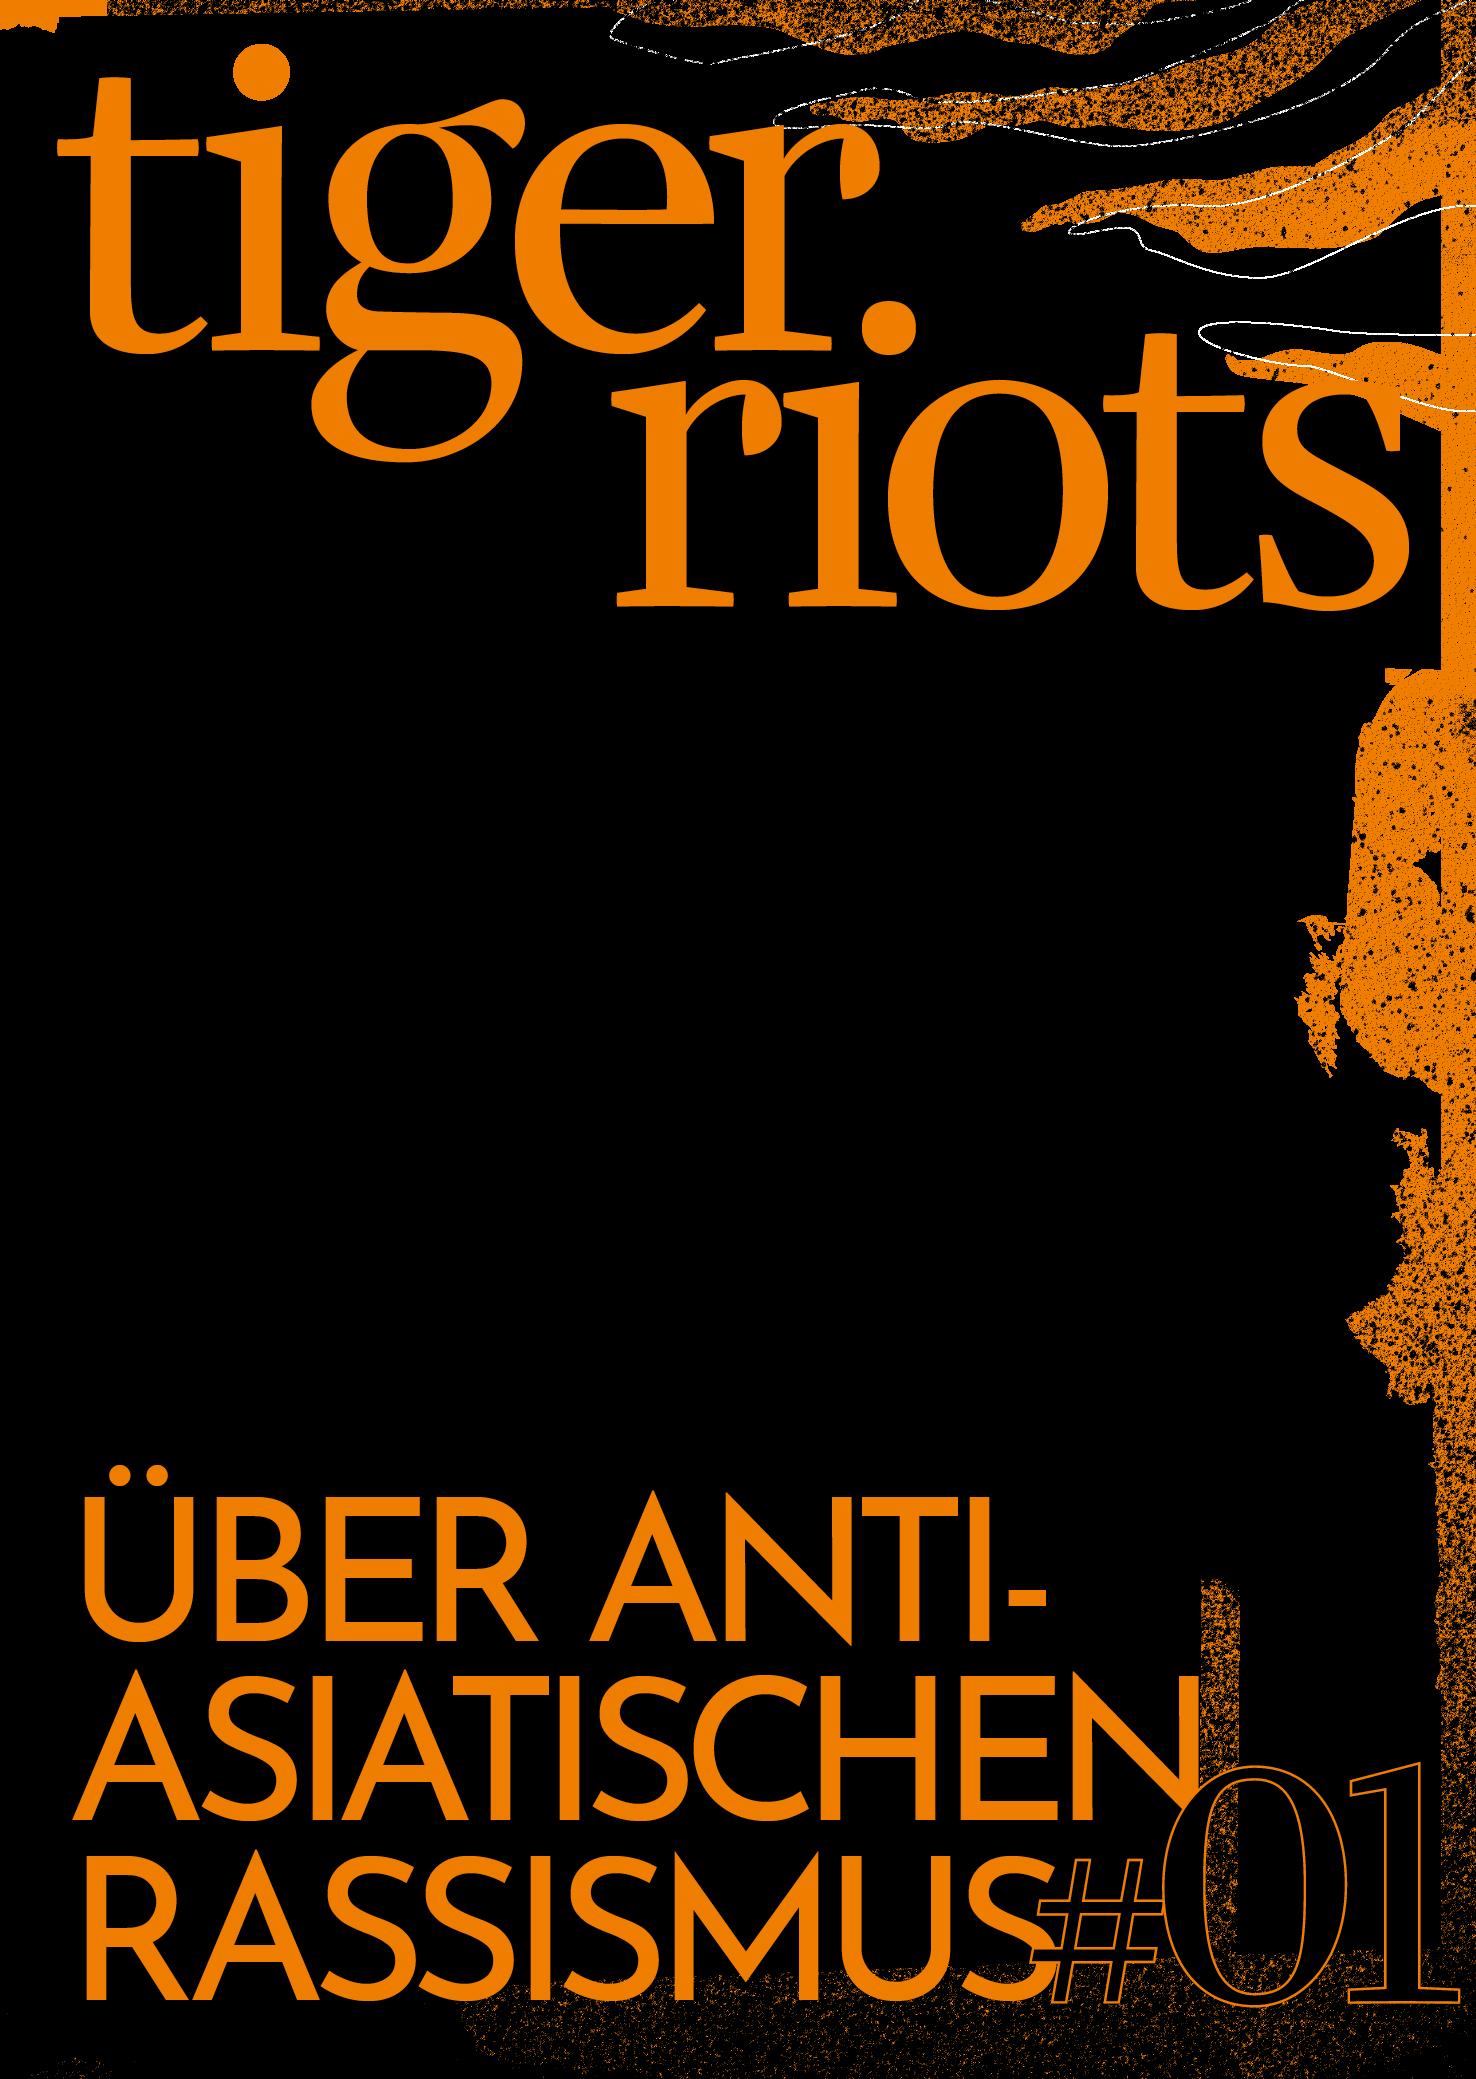 Tiger.Riots_Zine01_FINAL